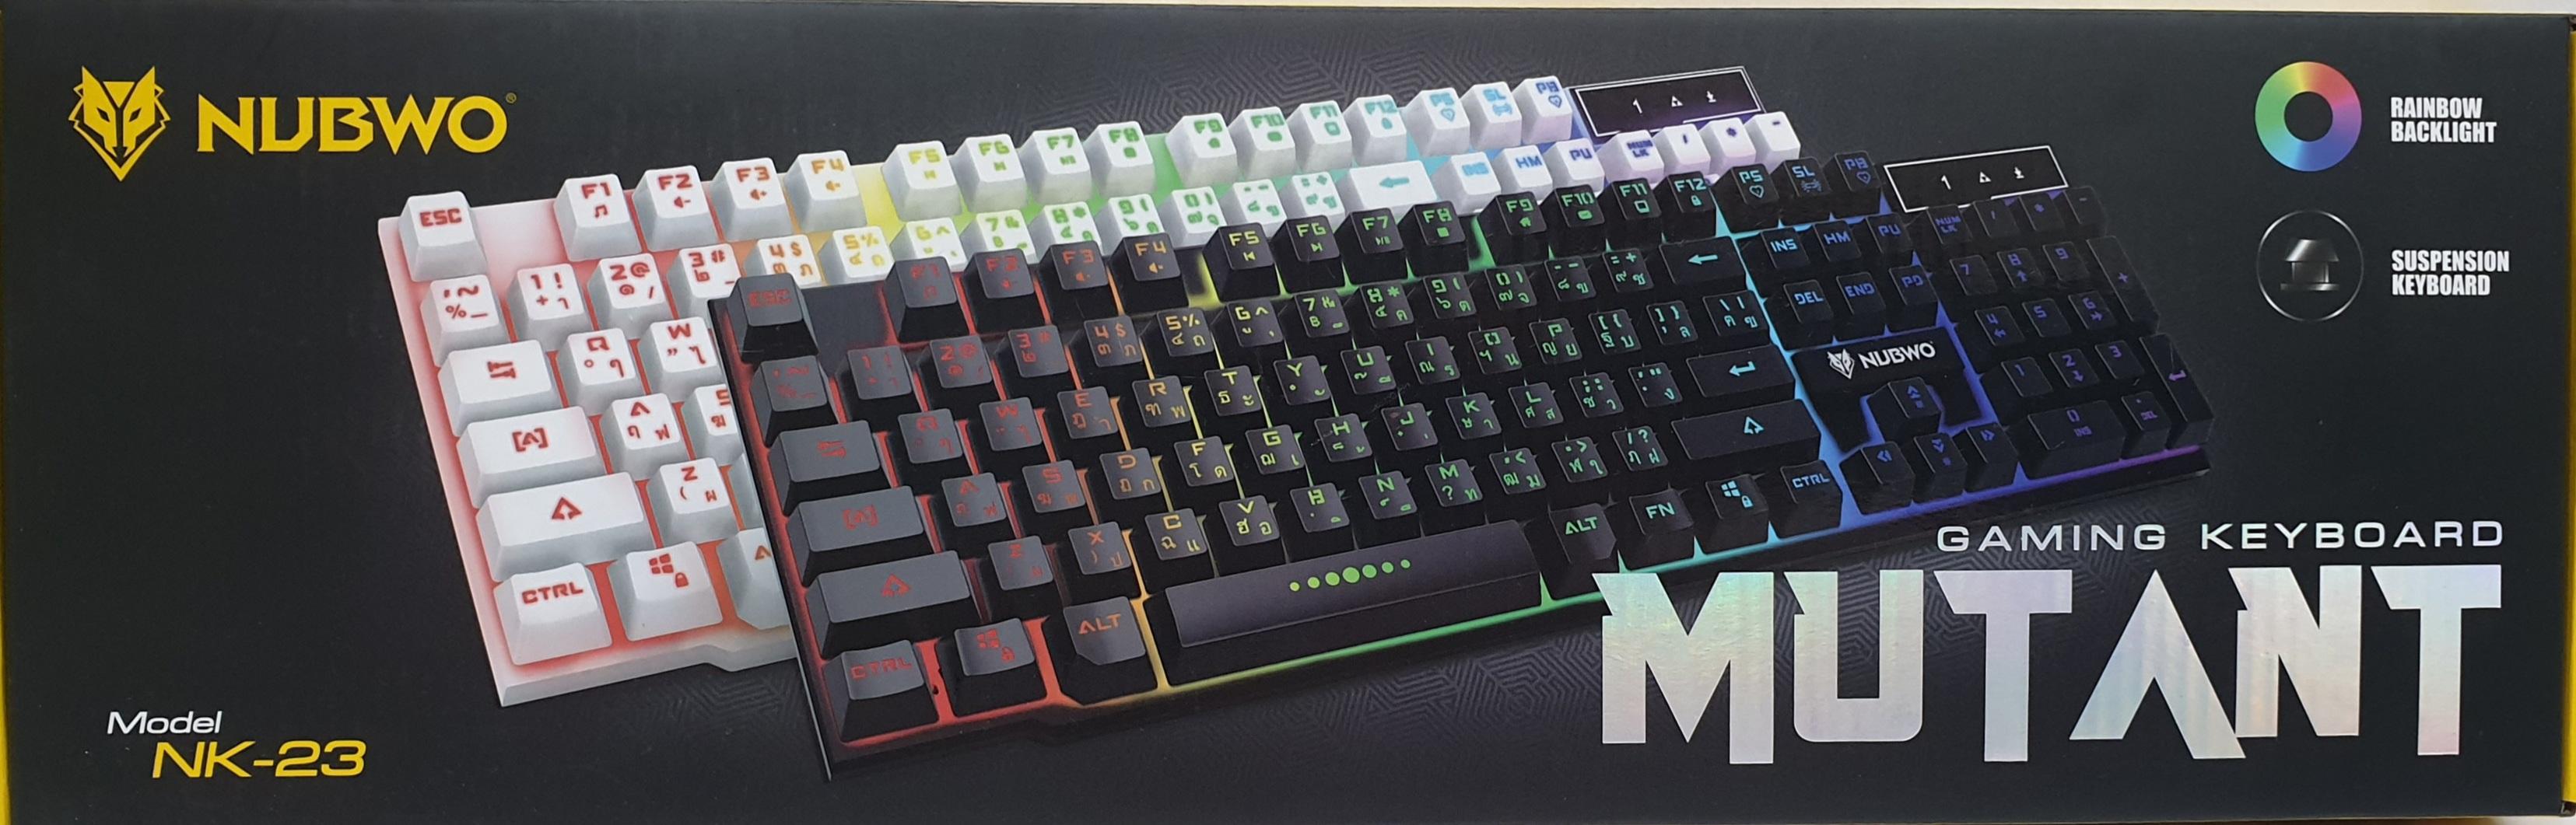 NUBWO NK 23 Mutant Wired USB Gaming Keyboard  Black